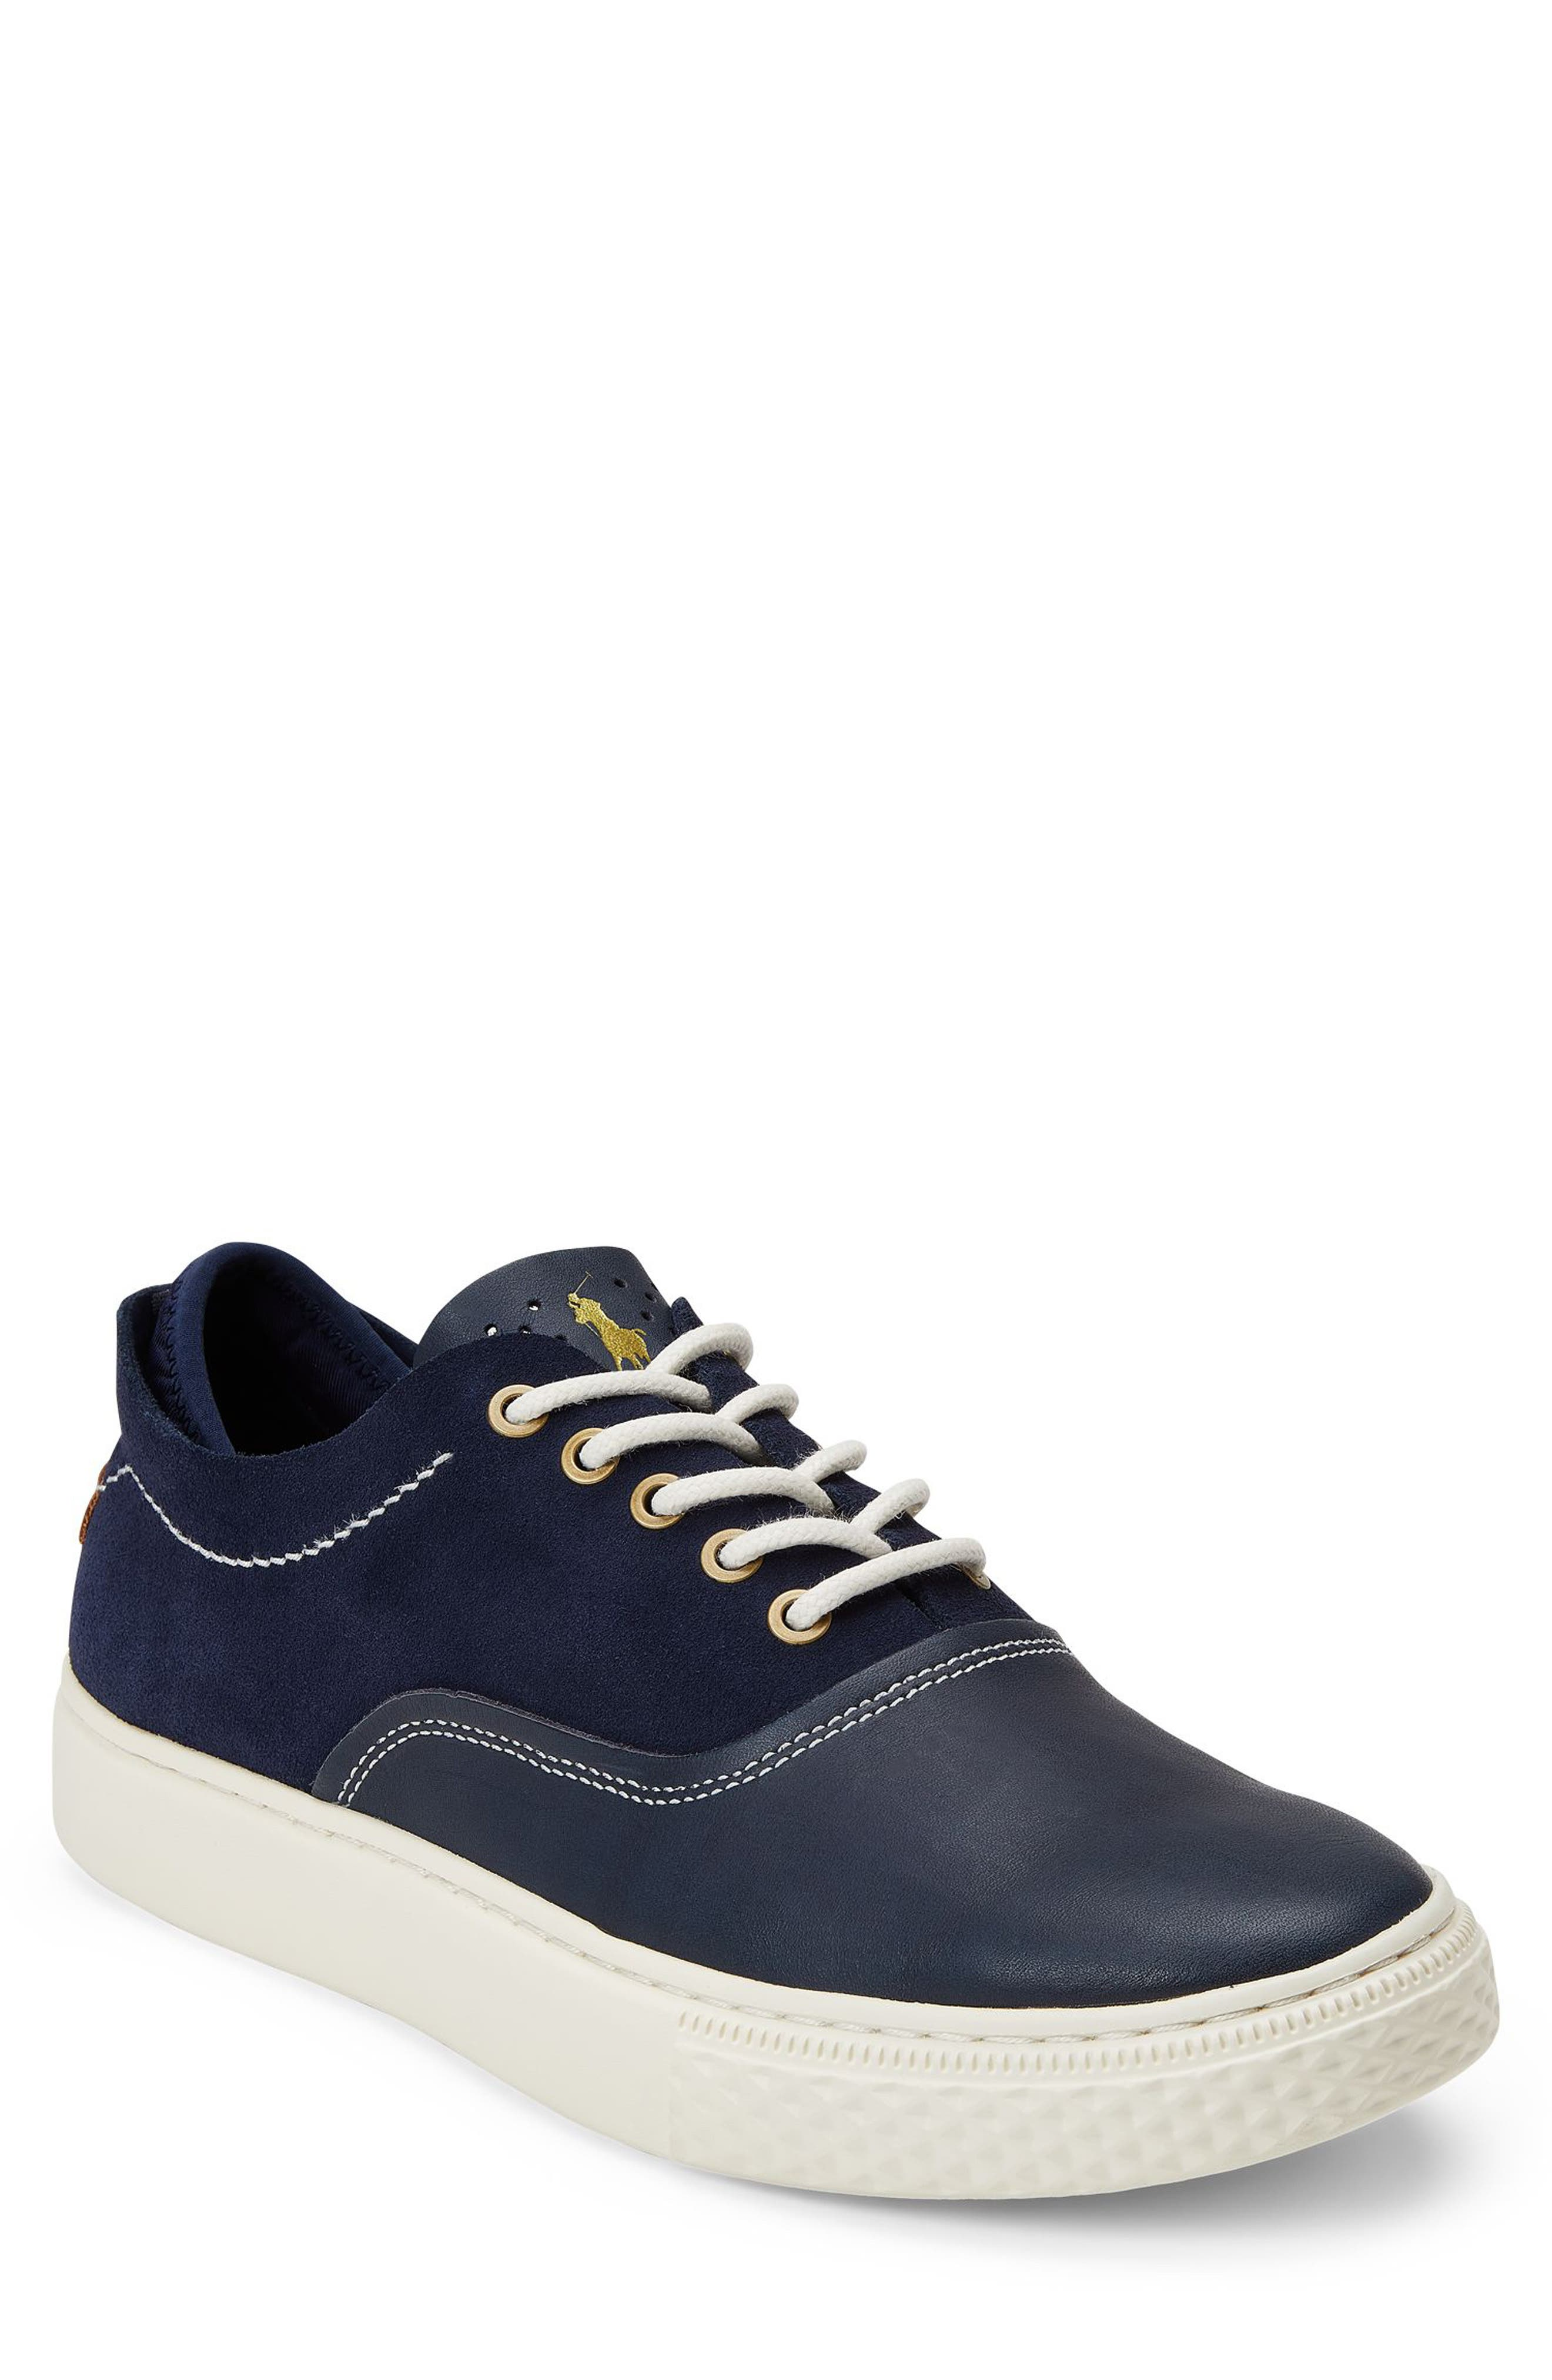 POLO RALPH LAUREN, Thorton 100 Sneaker, Alternate thumbnail 6, color, 410